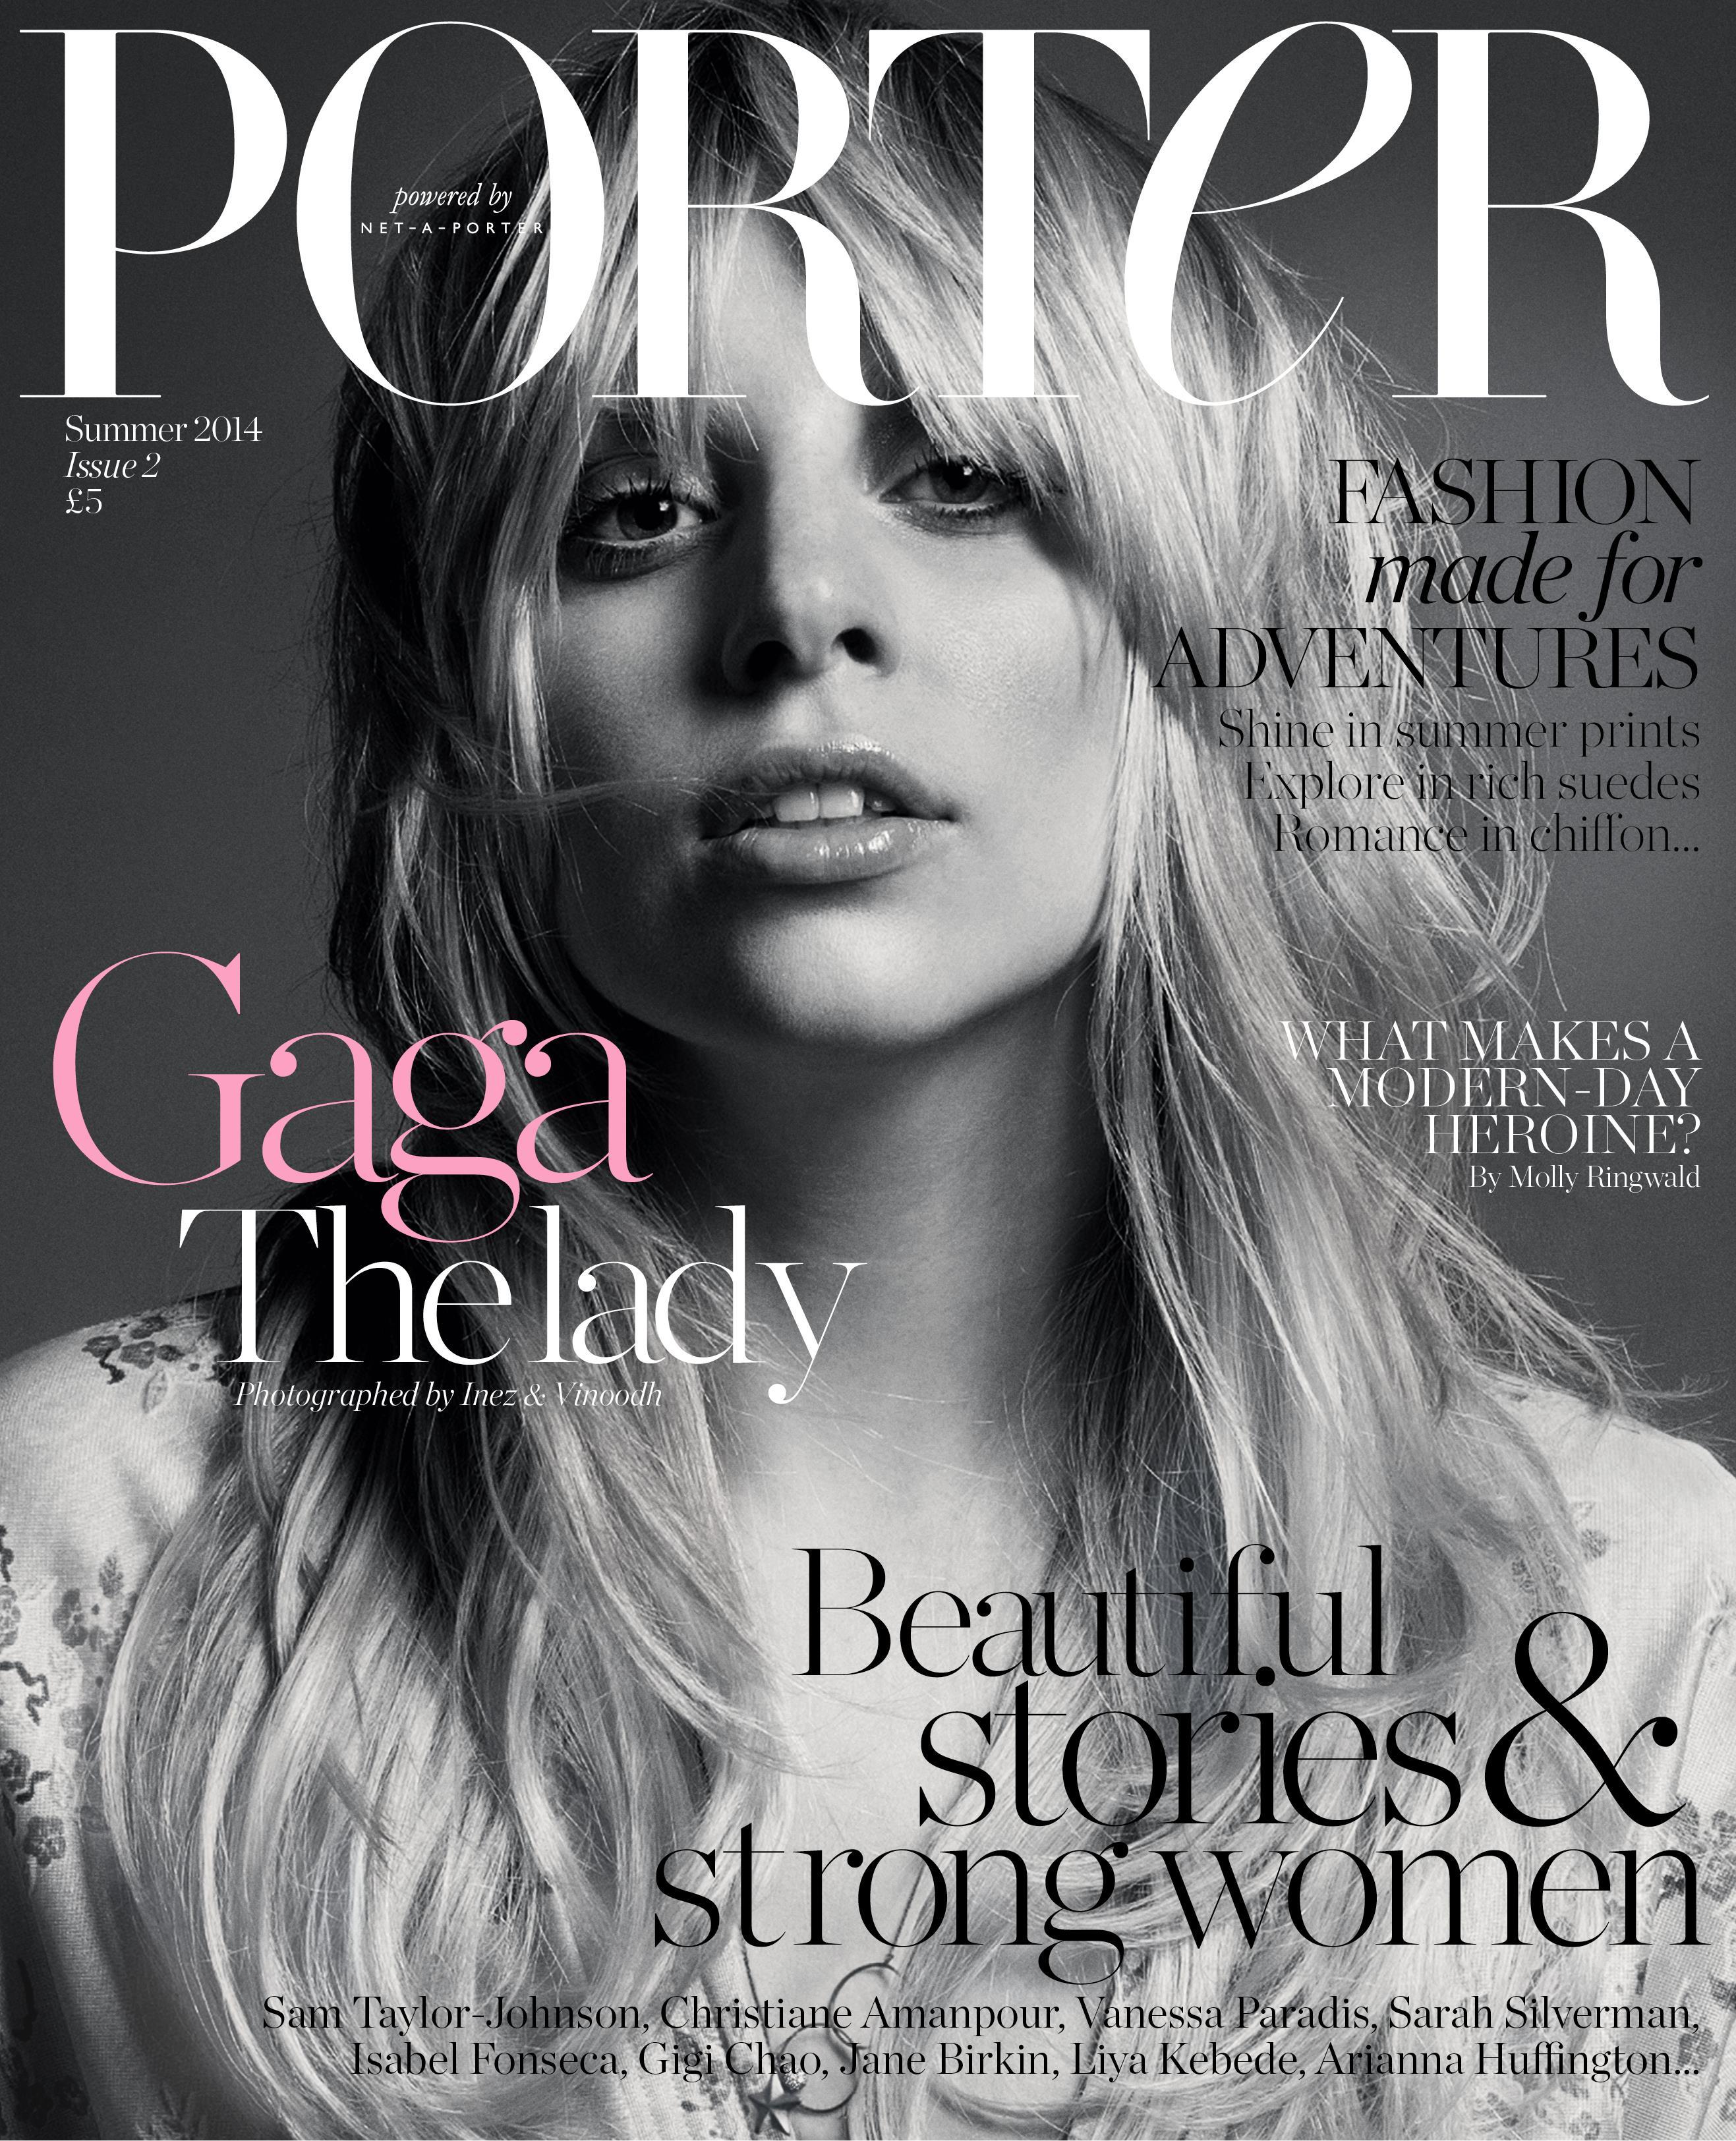 Porter Lady Gaga cover ()